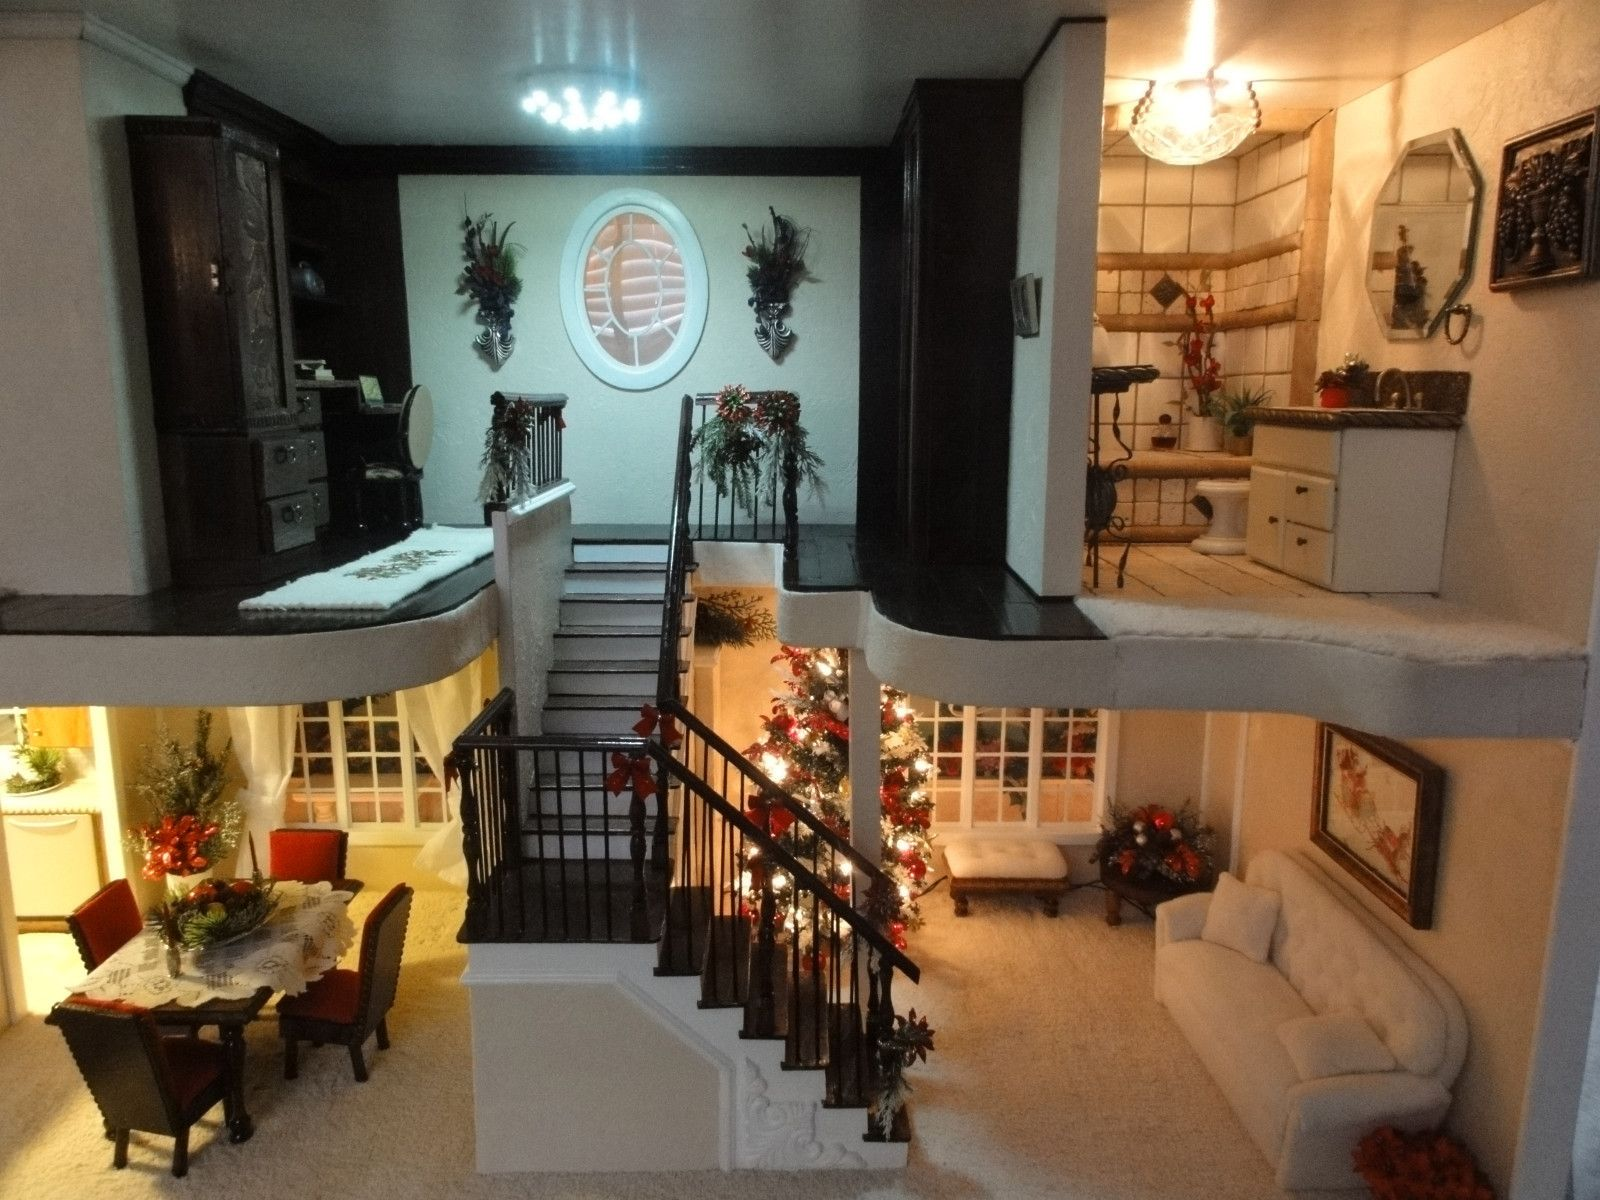 the ultimate custom barbie house ebay barbie 39 s bungalow pinterest barbie house barbie. Black Bedroom Furniture Sets. Home Design Ideas